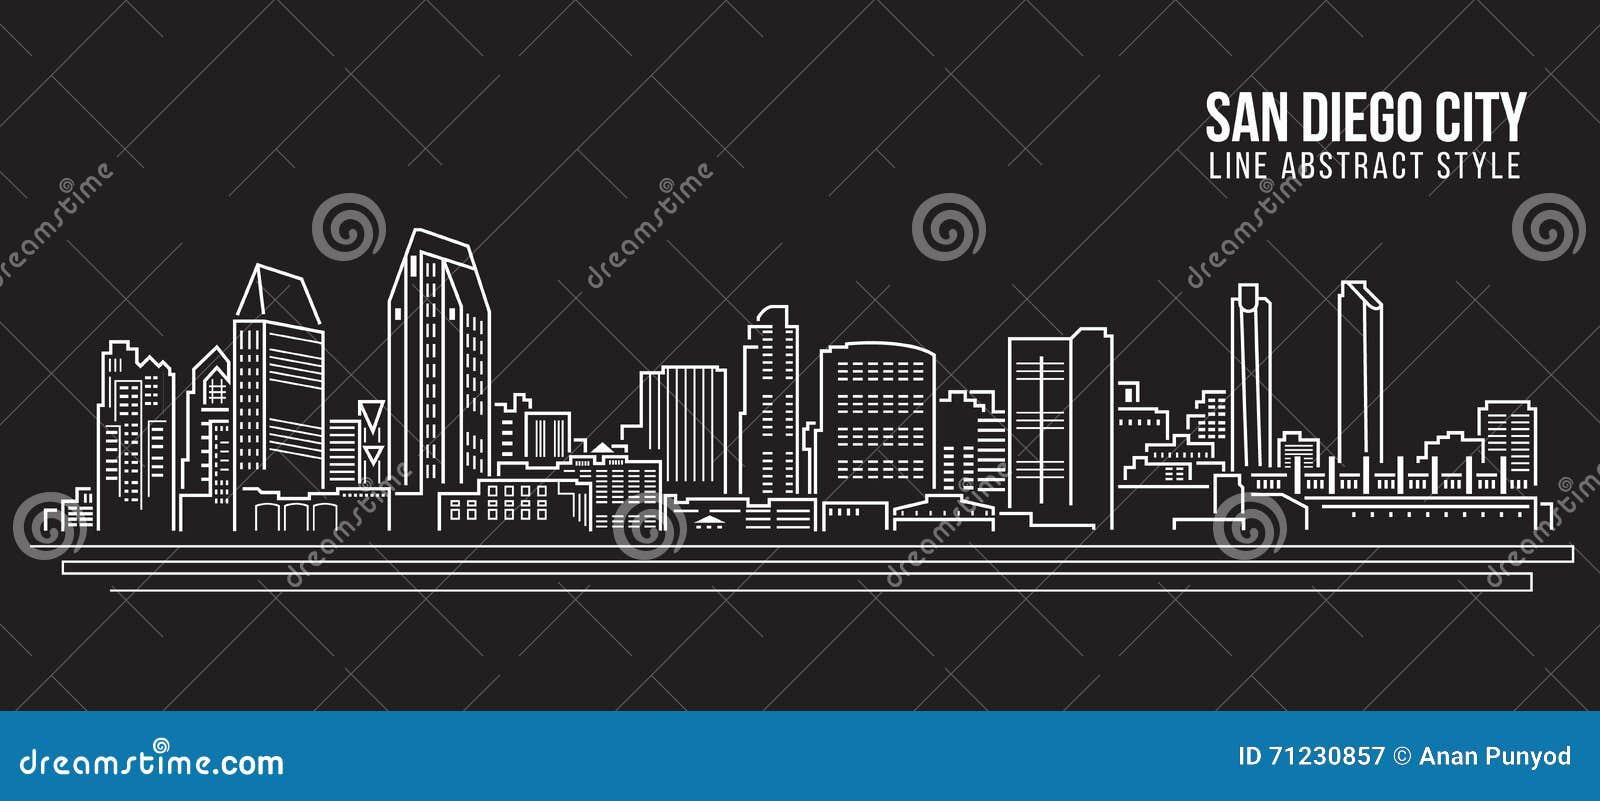 Line Art City : Cityscape building line art vector illustration design san diego